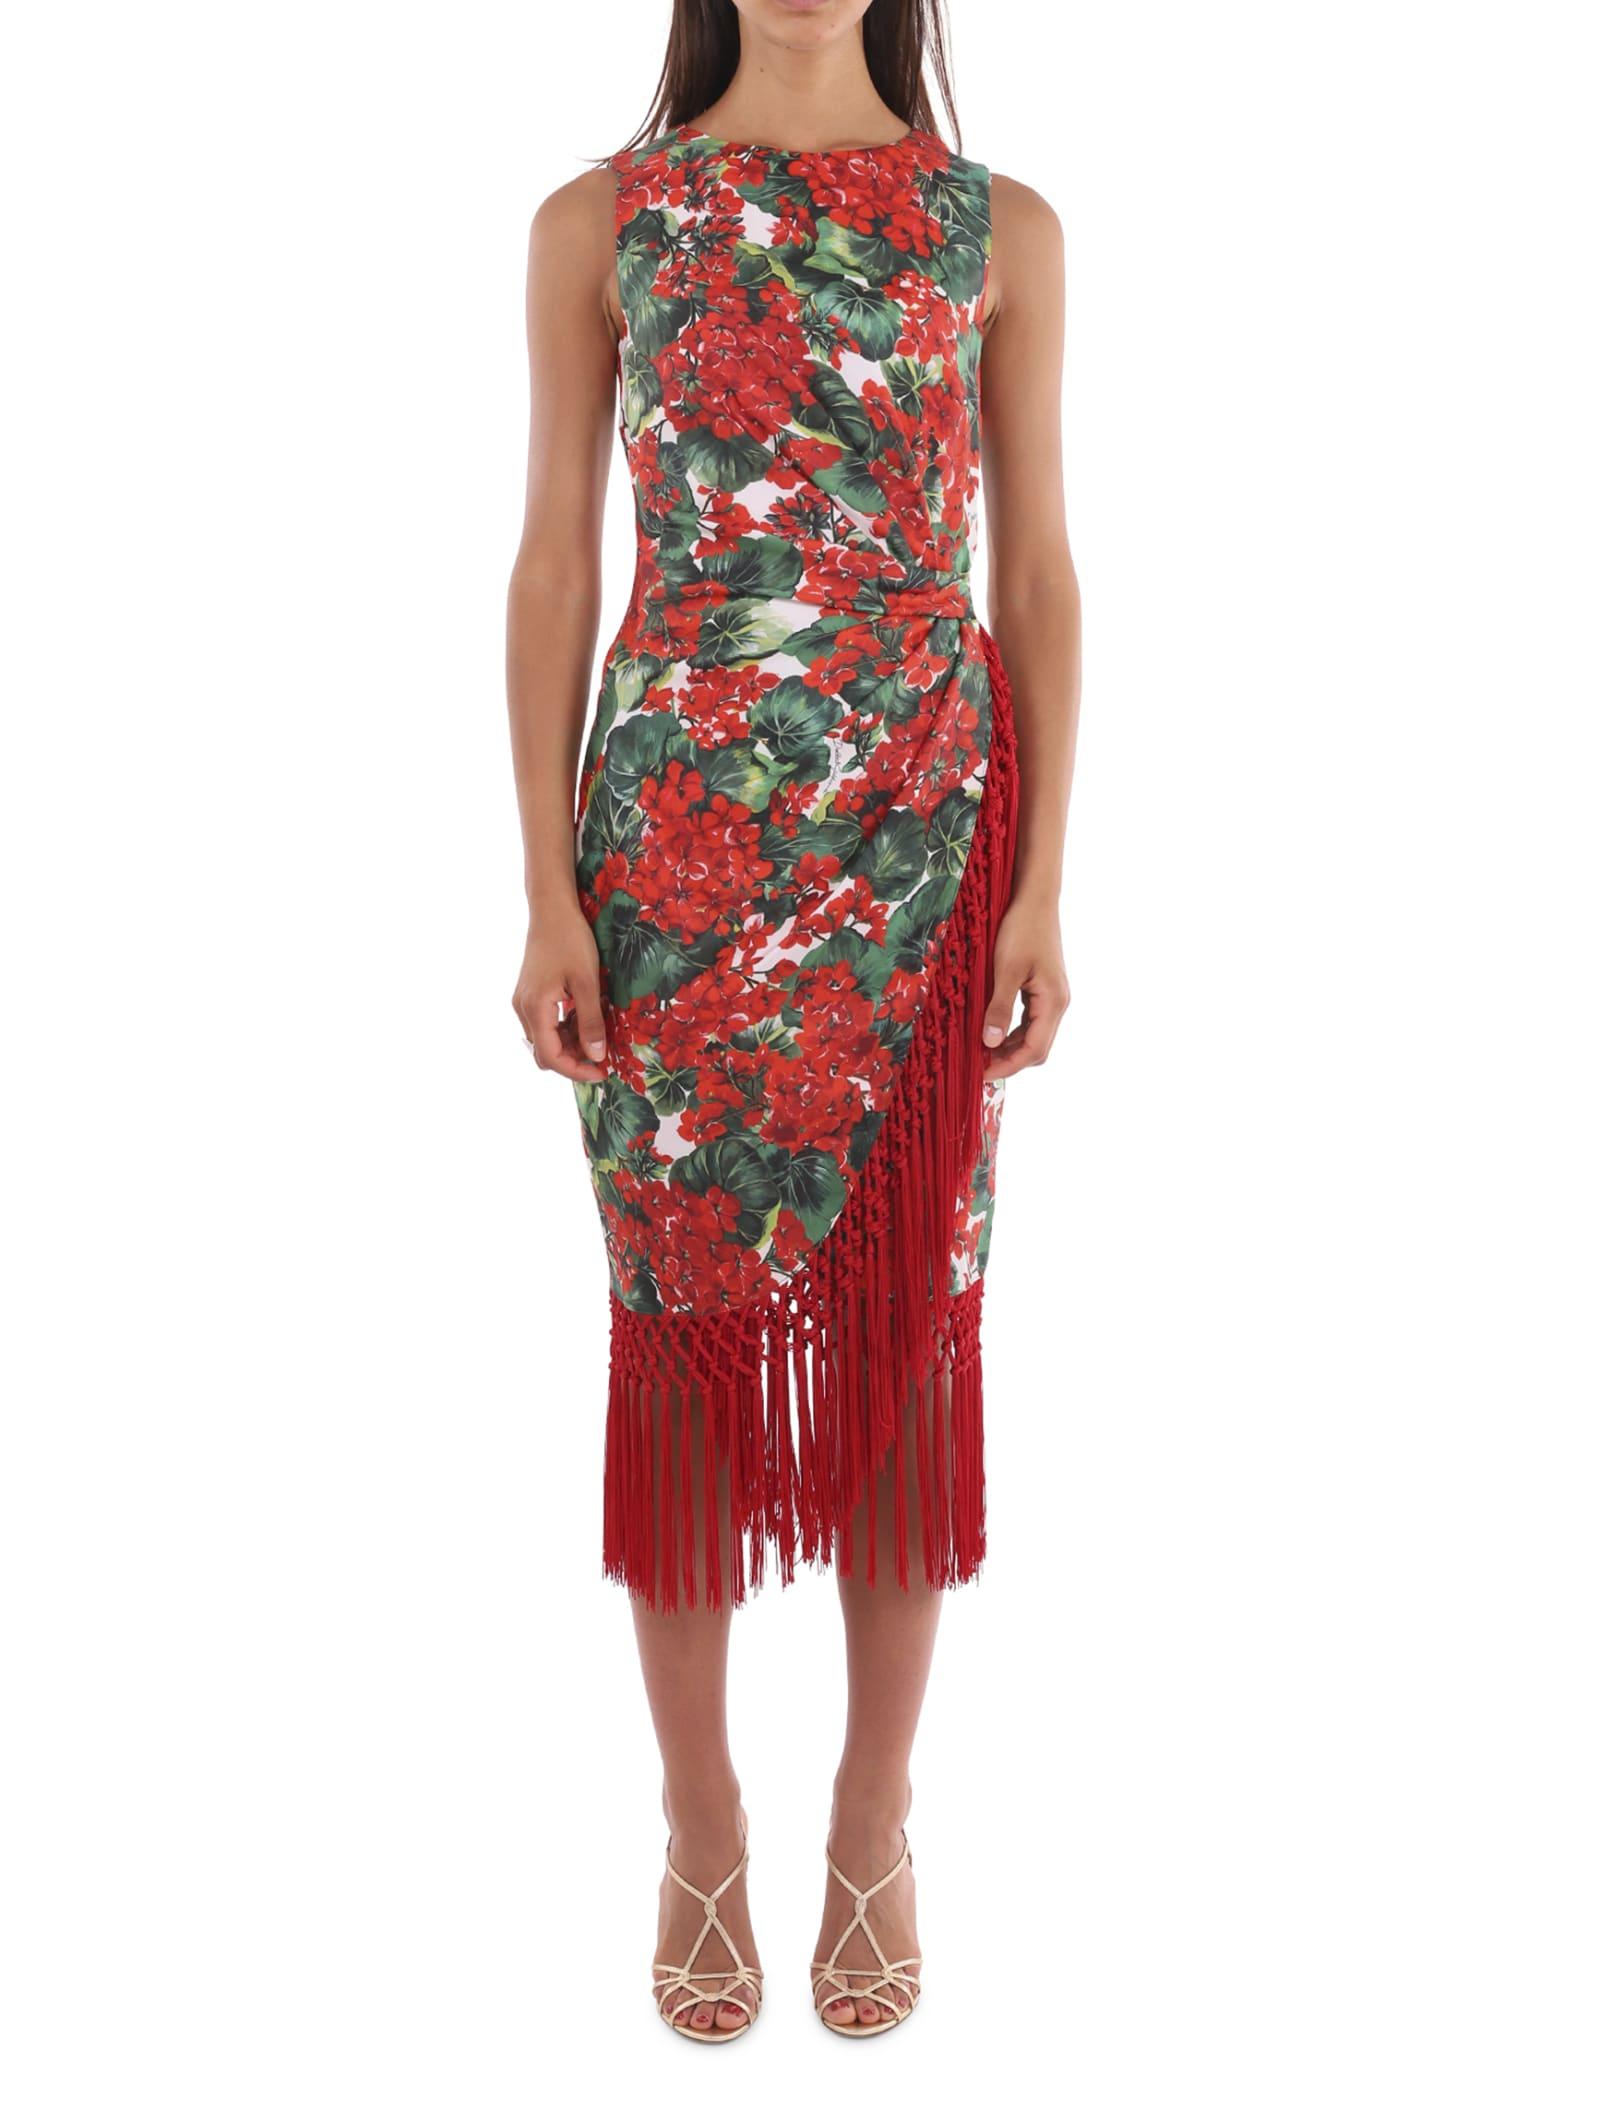 Dolce & Gabbana Geranium Fringed Dress